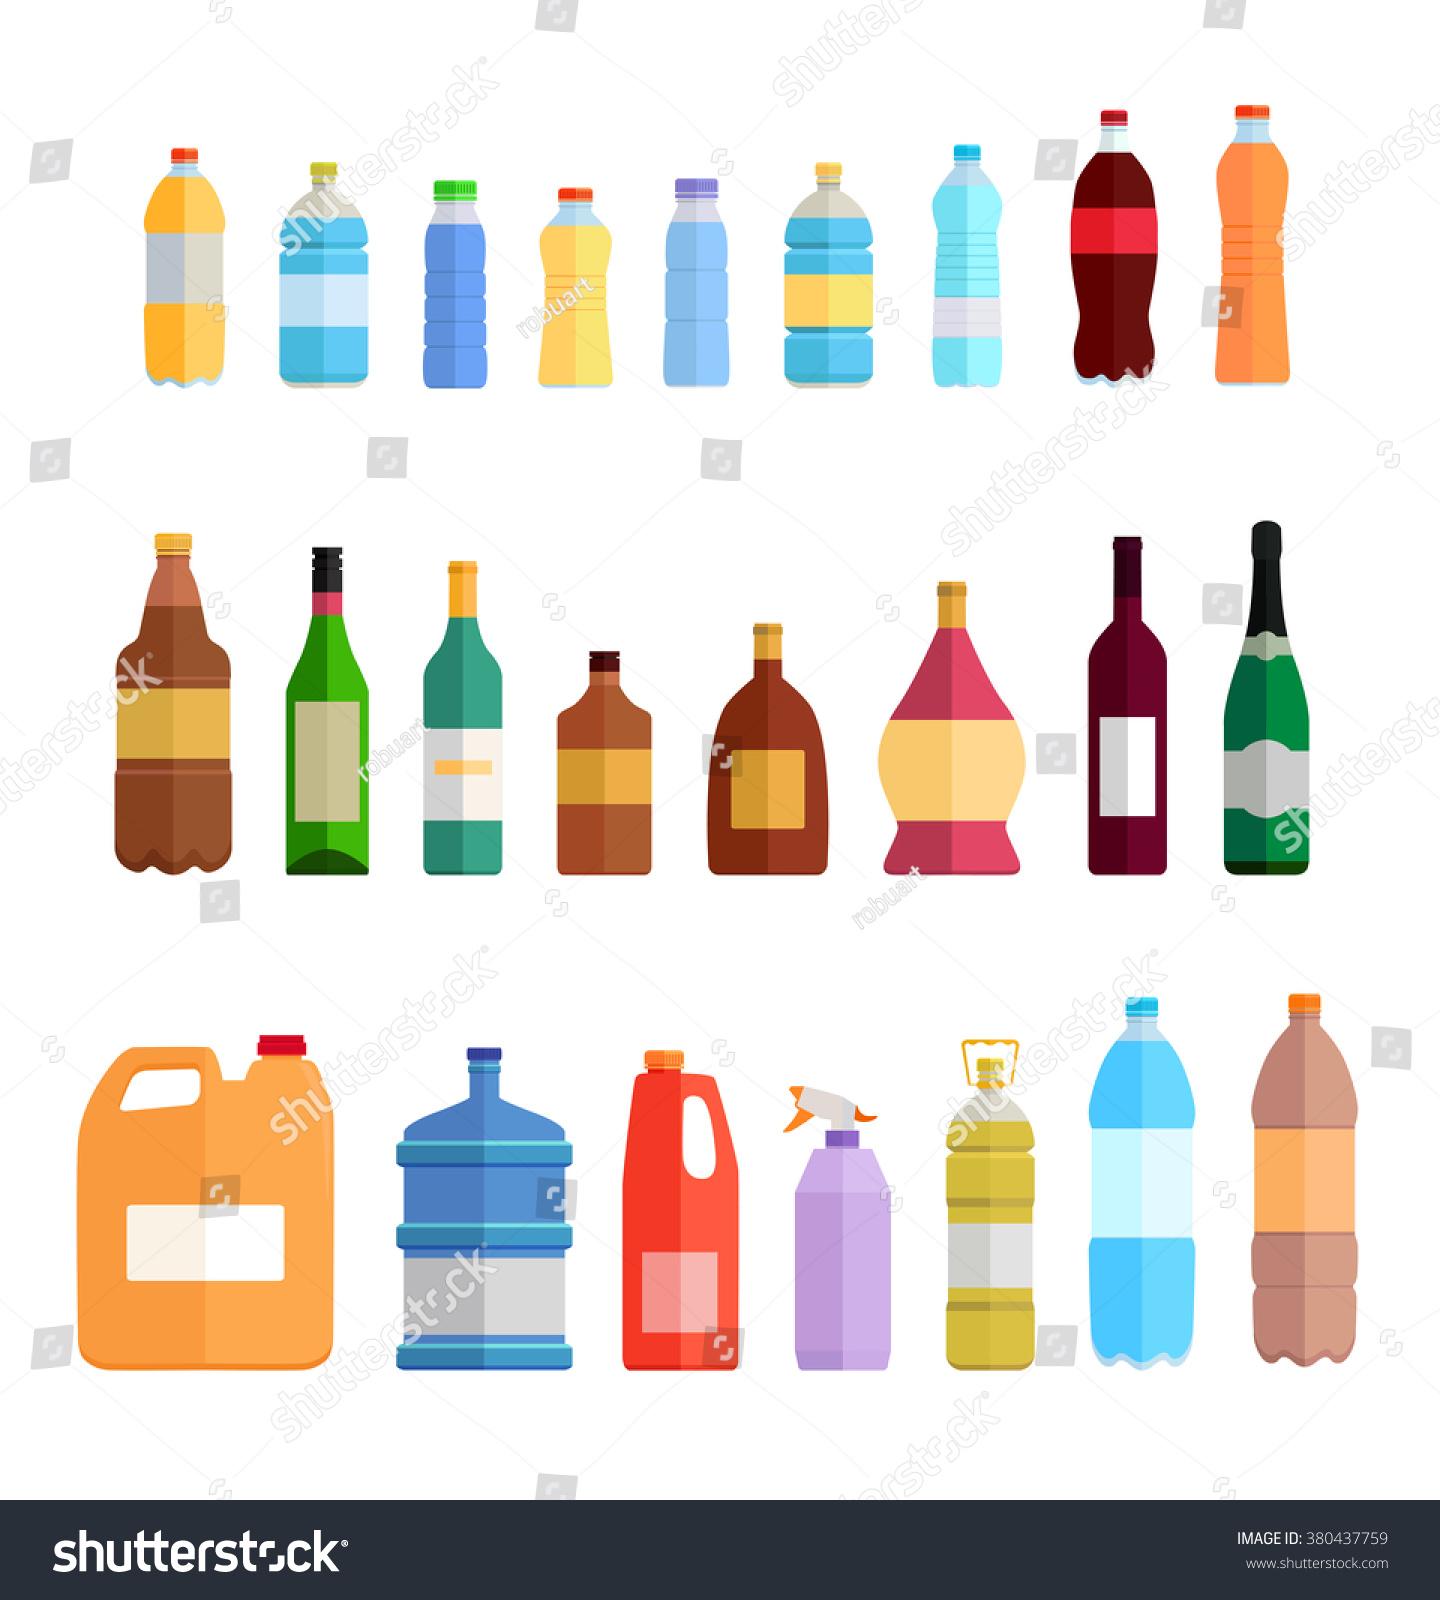 Graphic Design Water Bottles